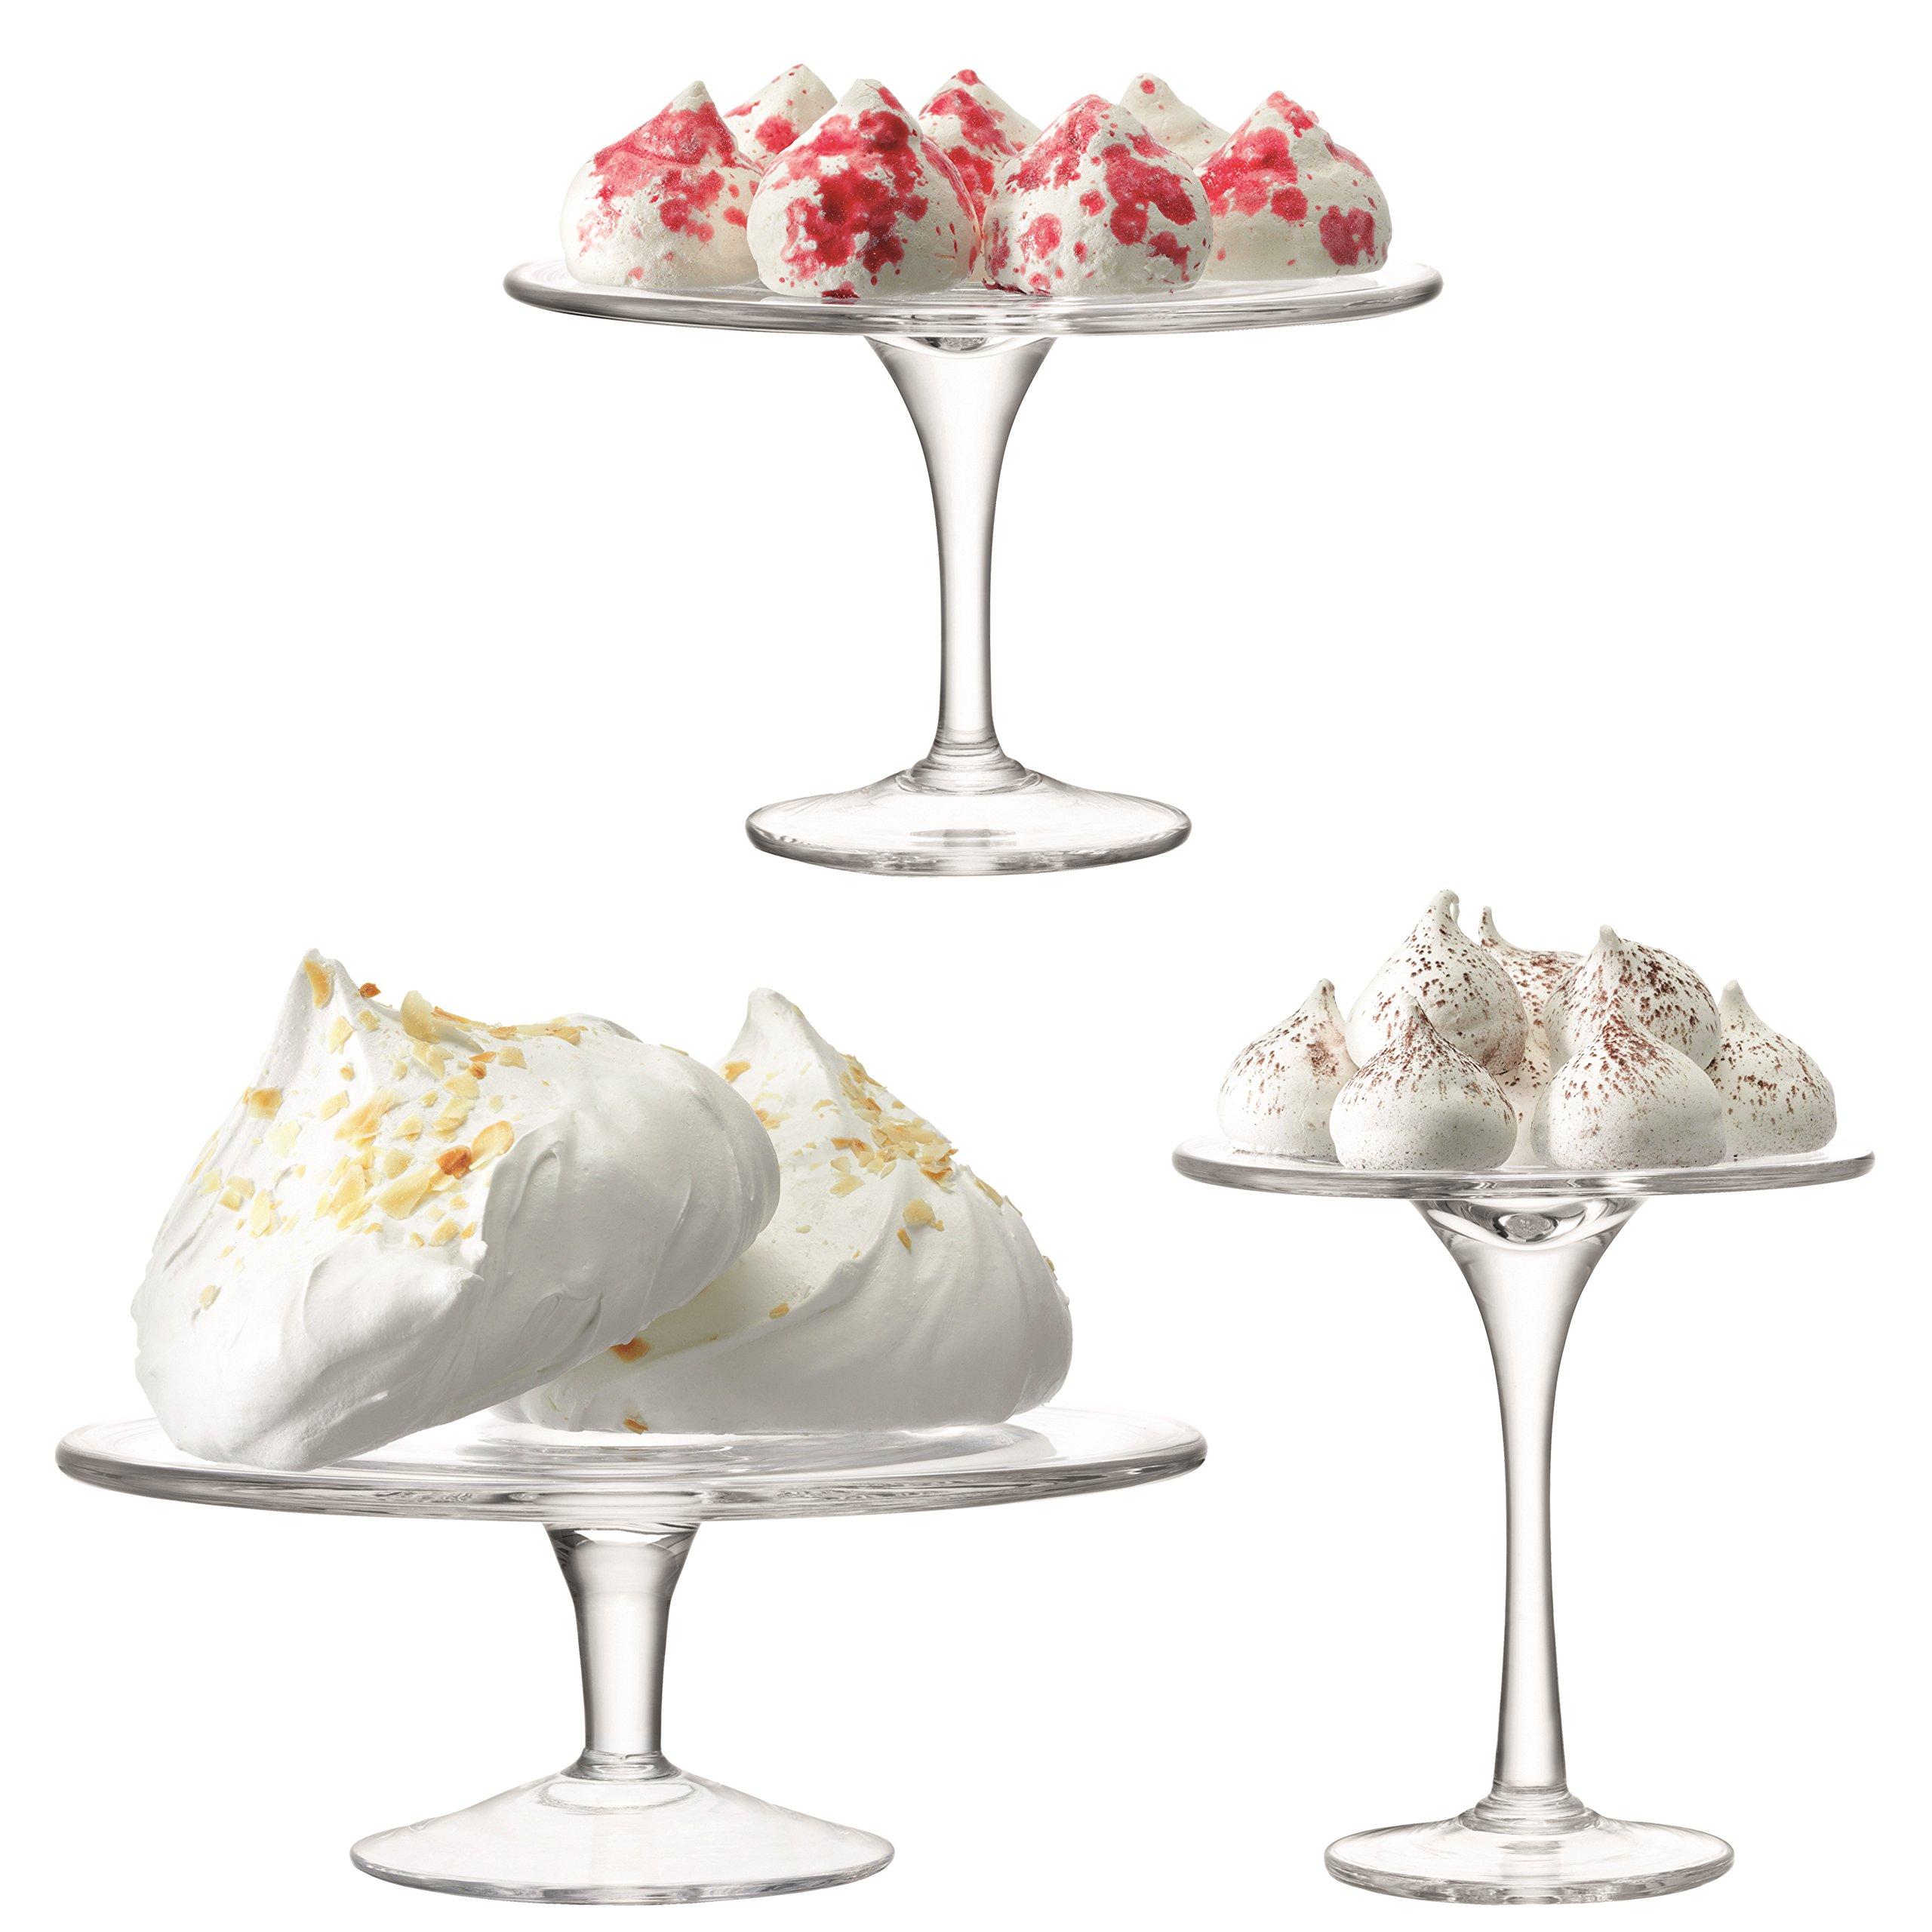 LSA International Serve Cake stand Set, 8.75''/5.5''/7'', Clear